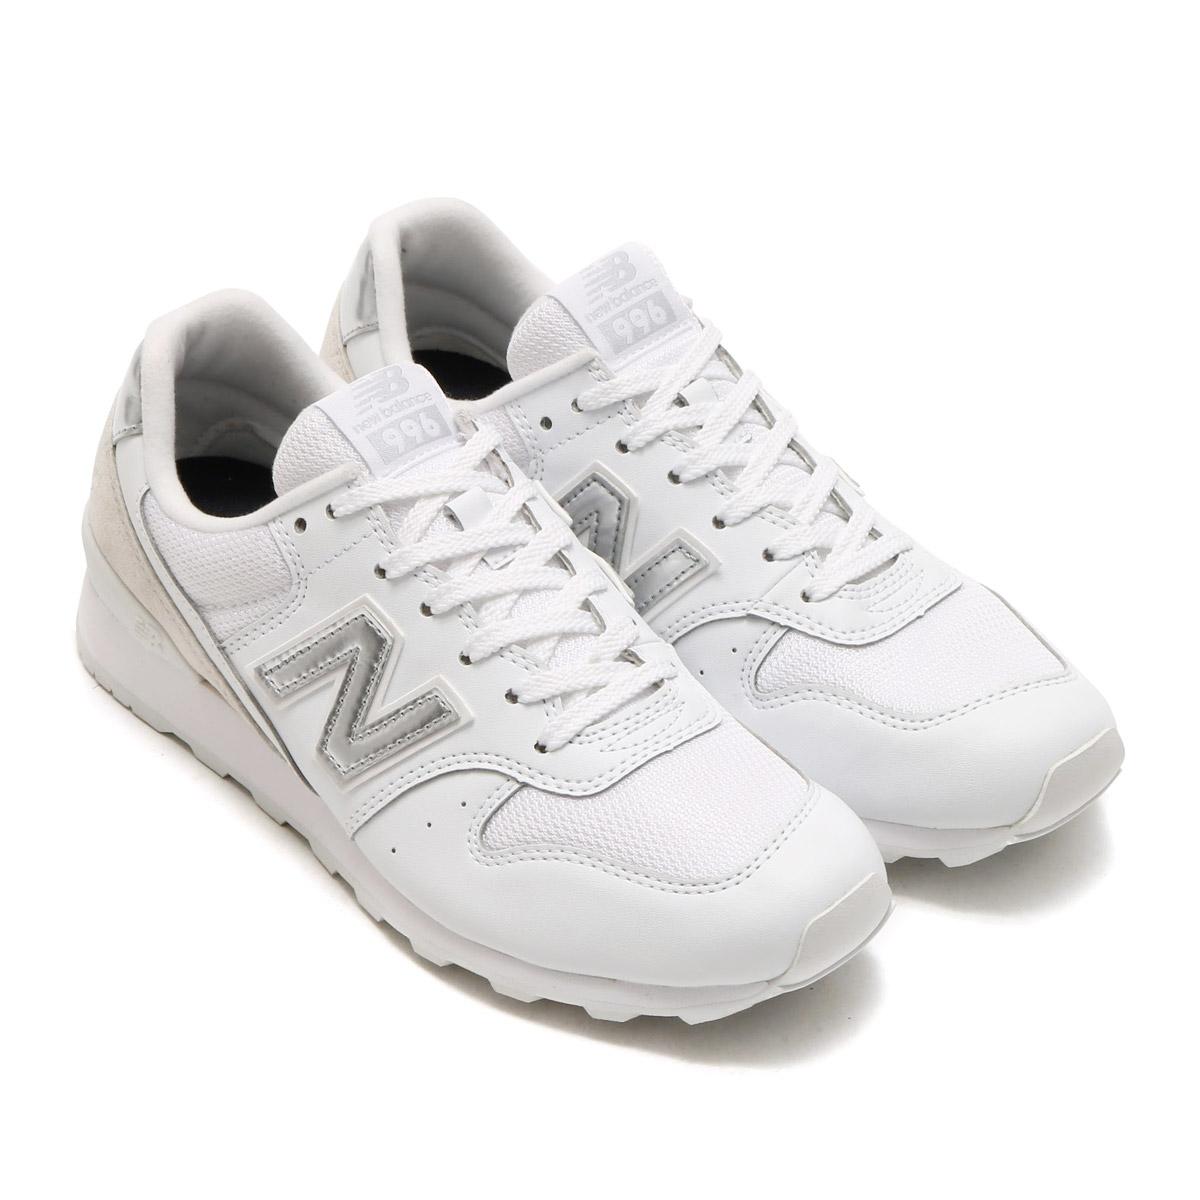 new balance wr996 white